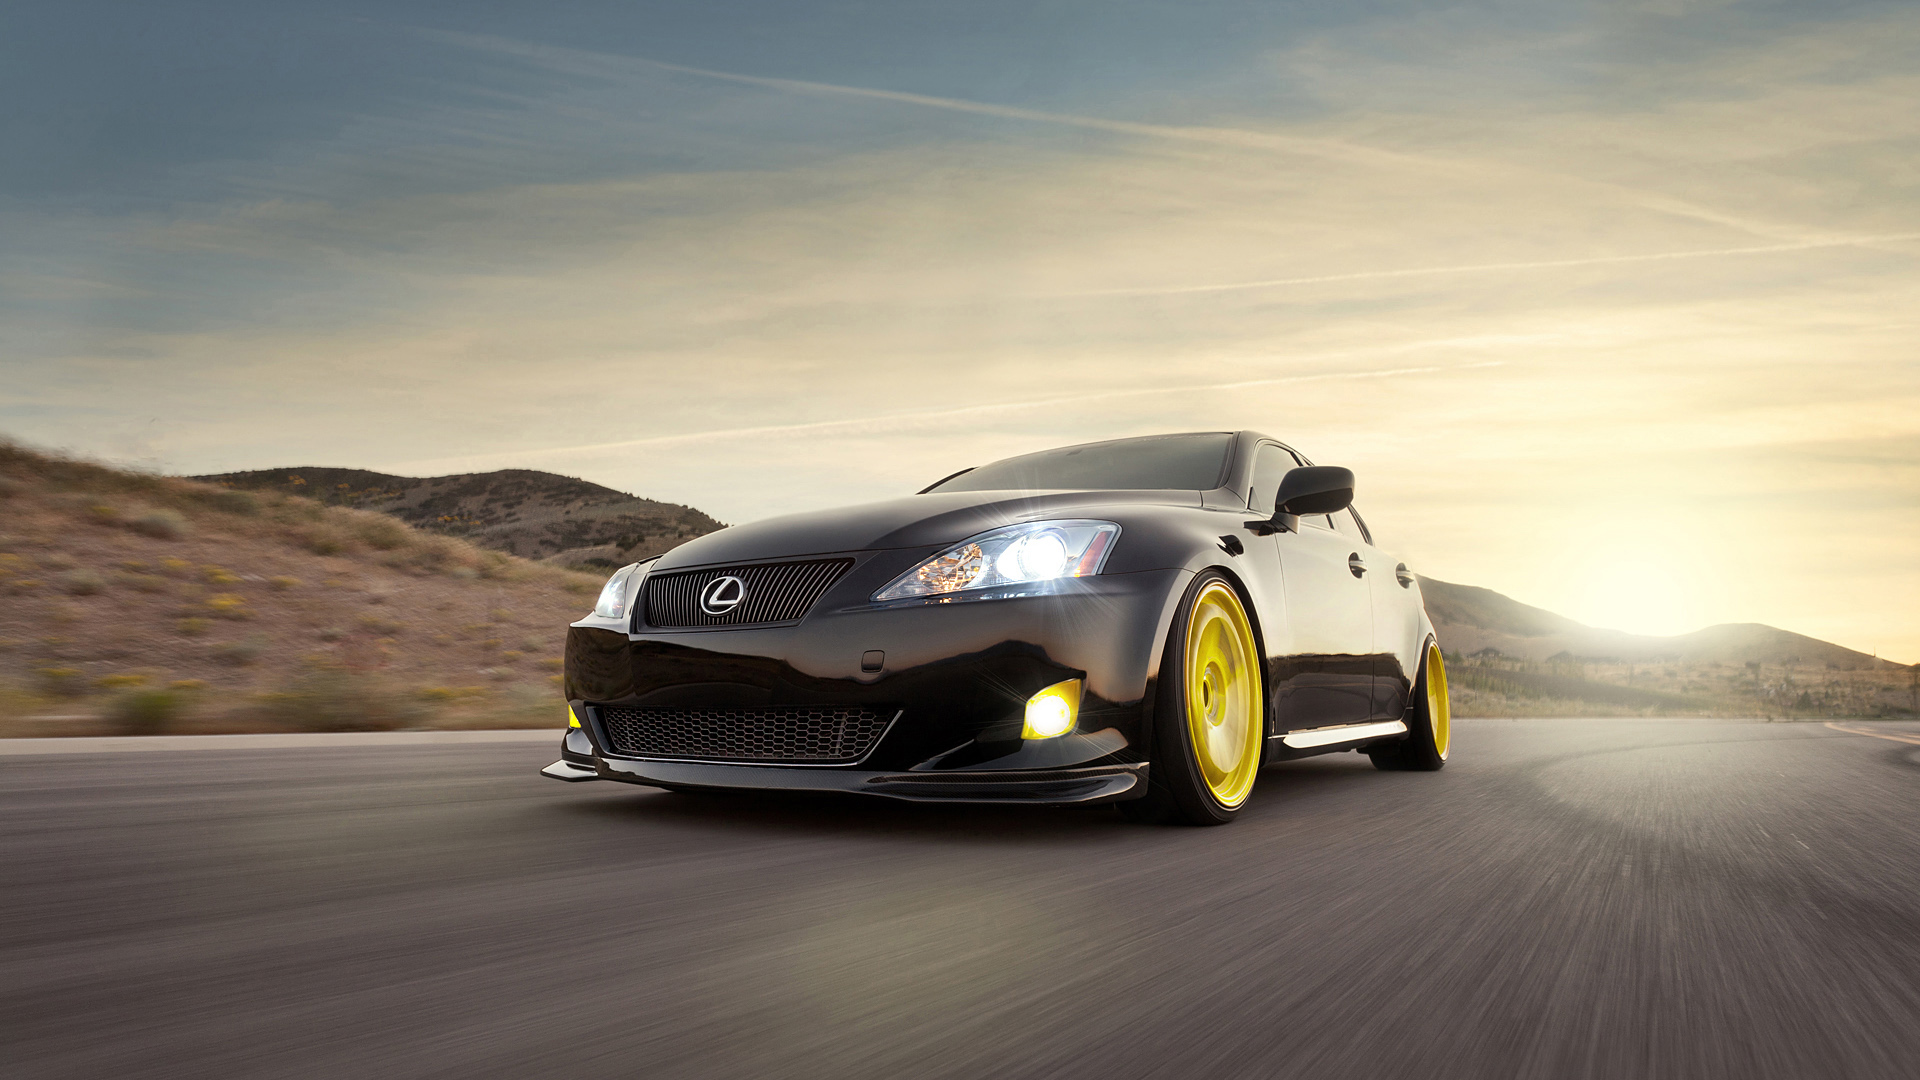 Lexus Is 350 Wallpaper Hd Car Wallpapers